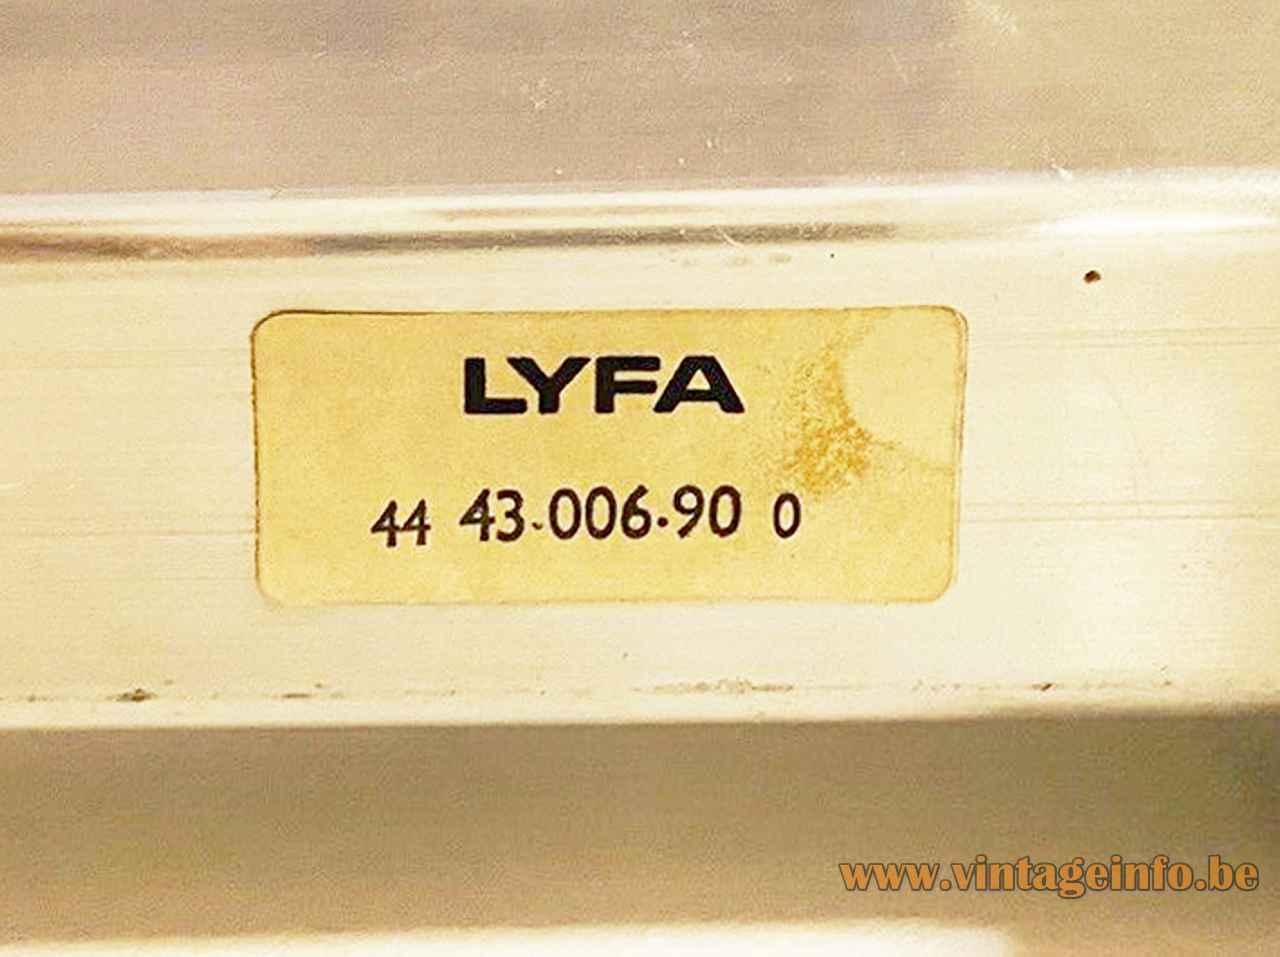 Lyfa Pan-Opticon wall lamp white paper label 1970s design: Bent Karlby Denmark 2 E14 sockets